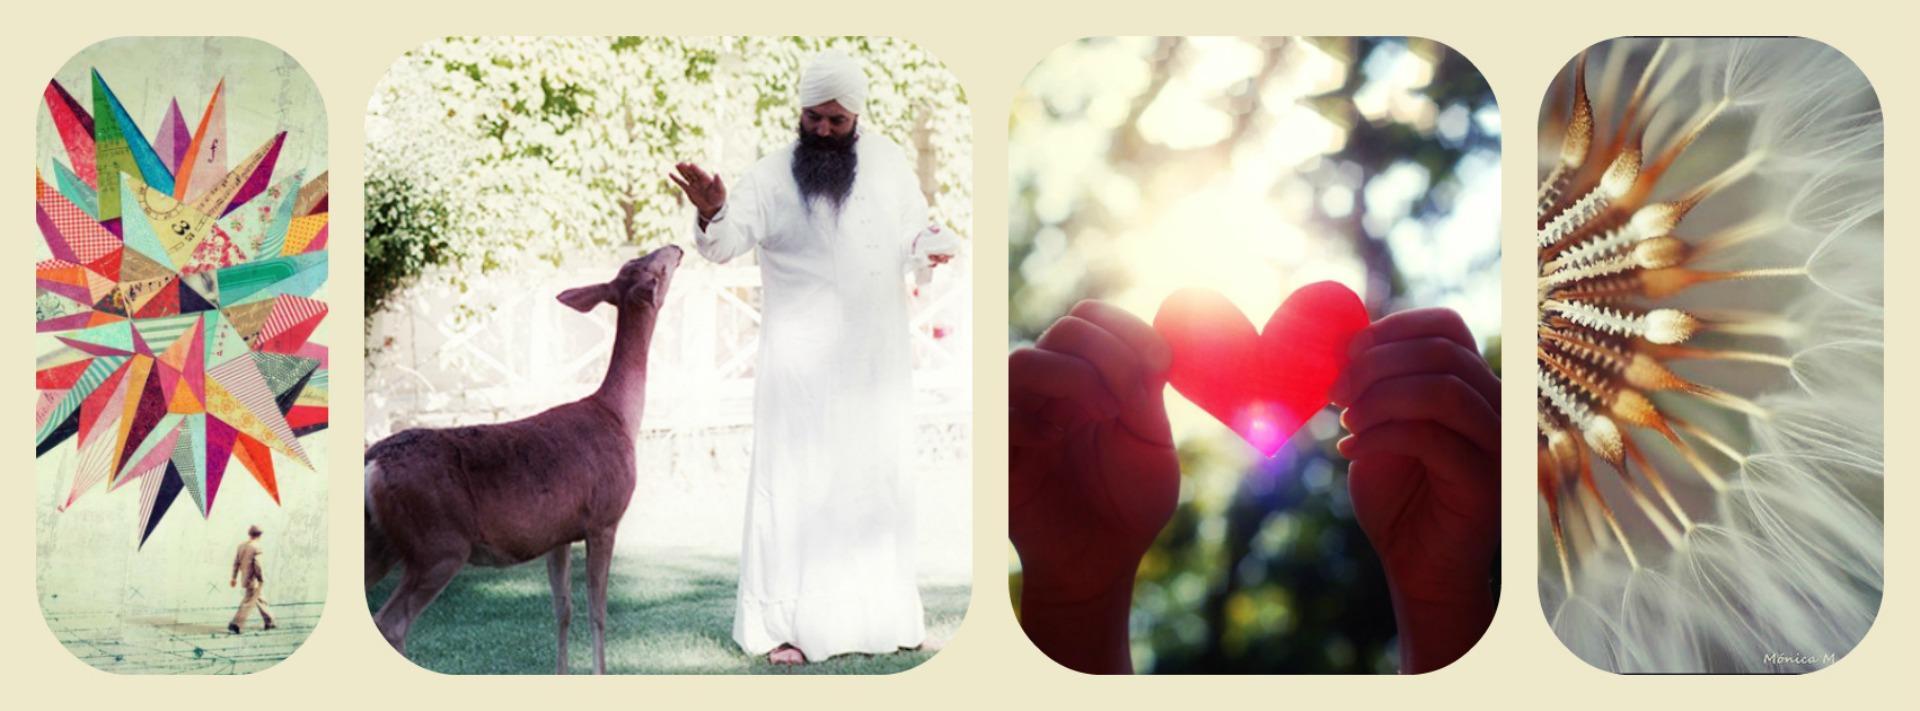 Love Now - Kundalini Yoga, Yoga Nidra and Man